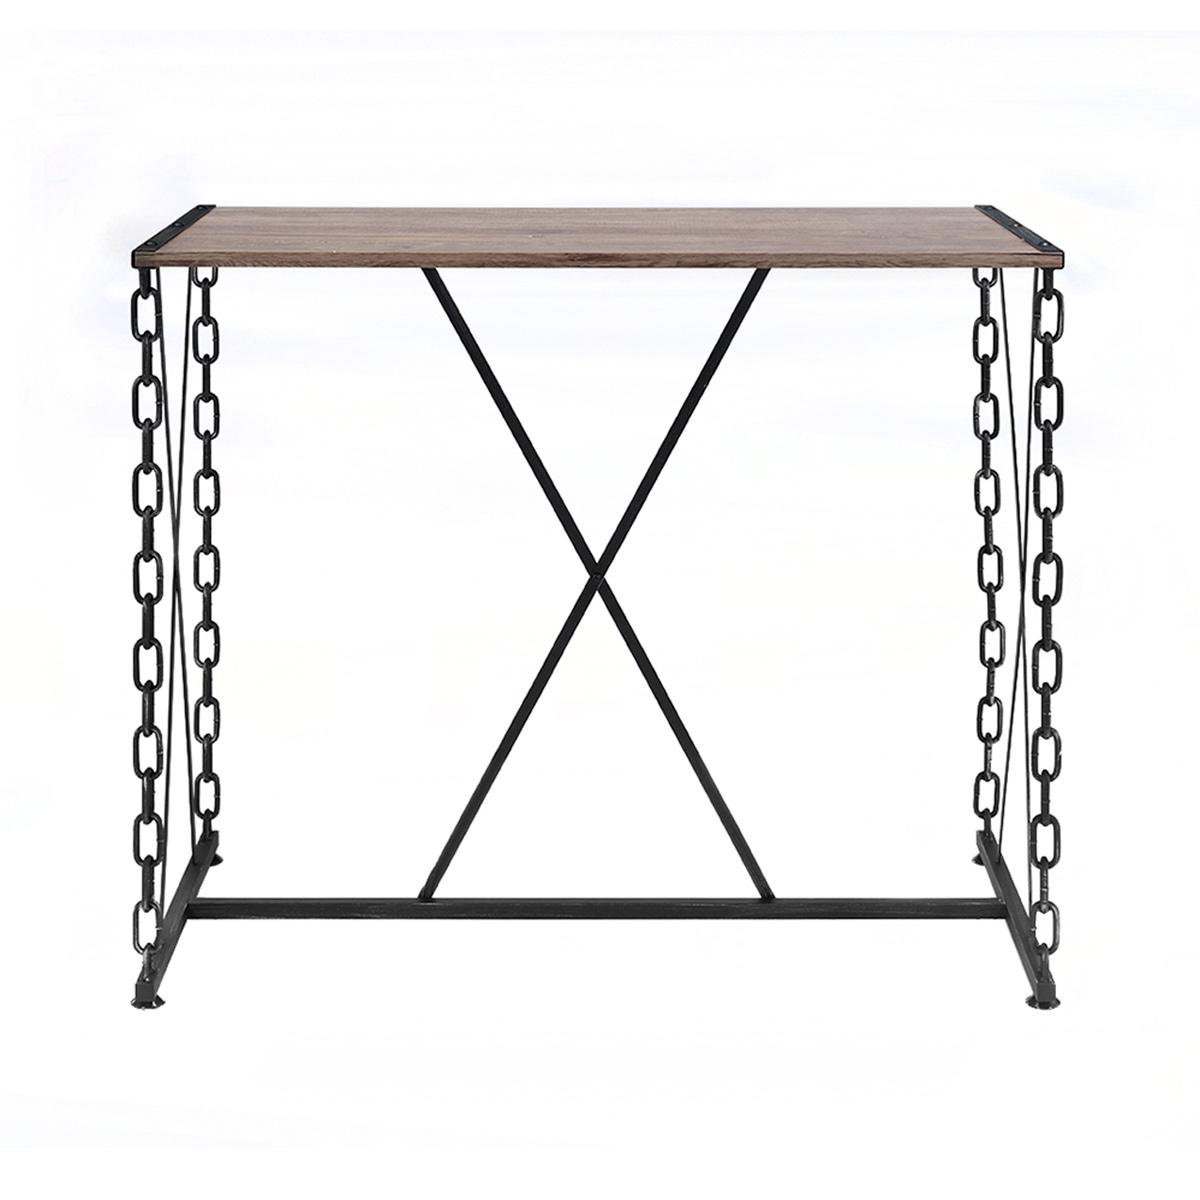 Acme Jobar Table